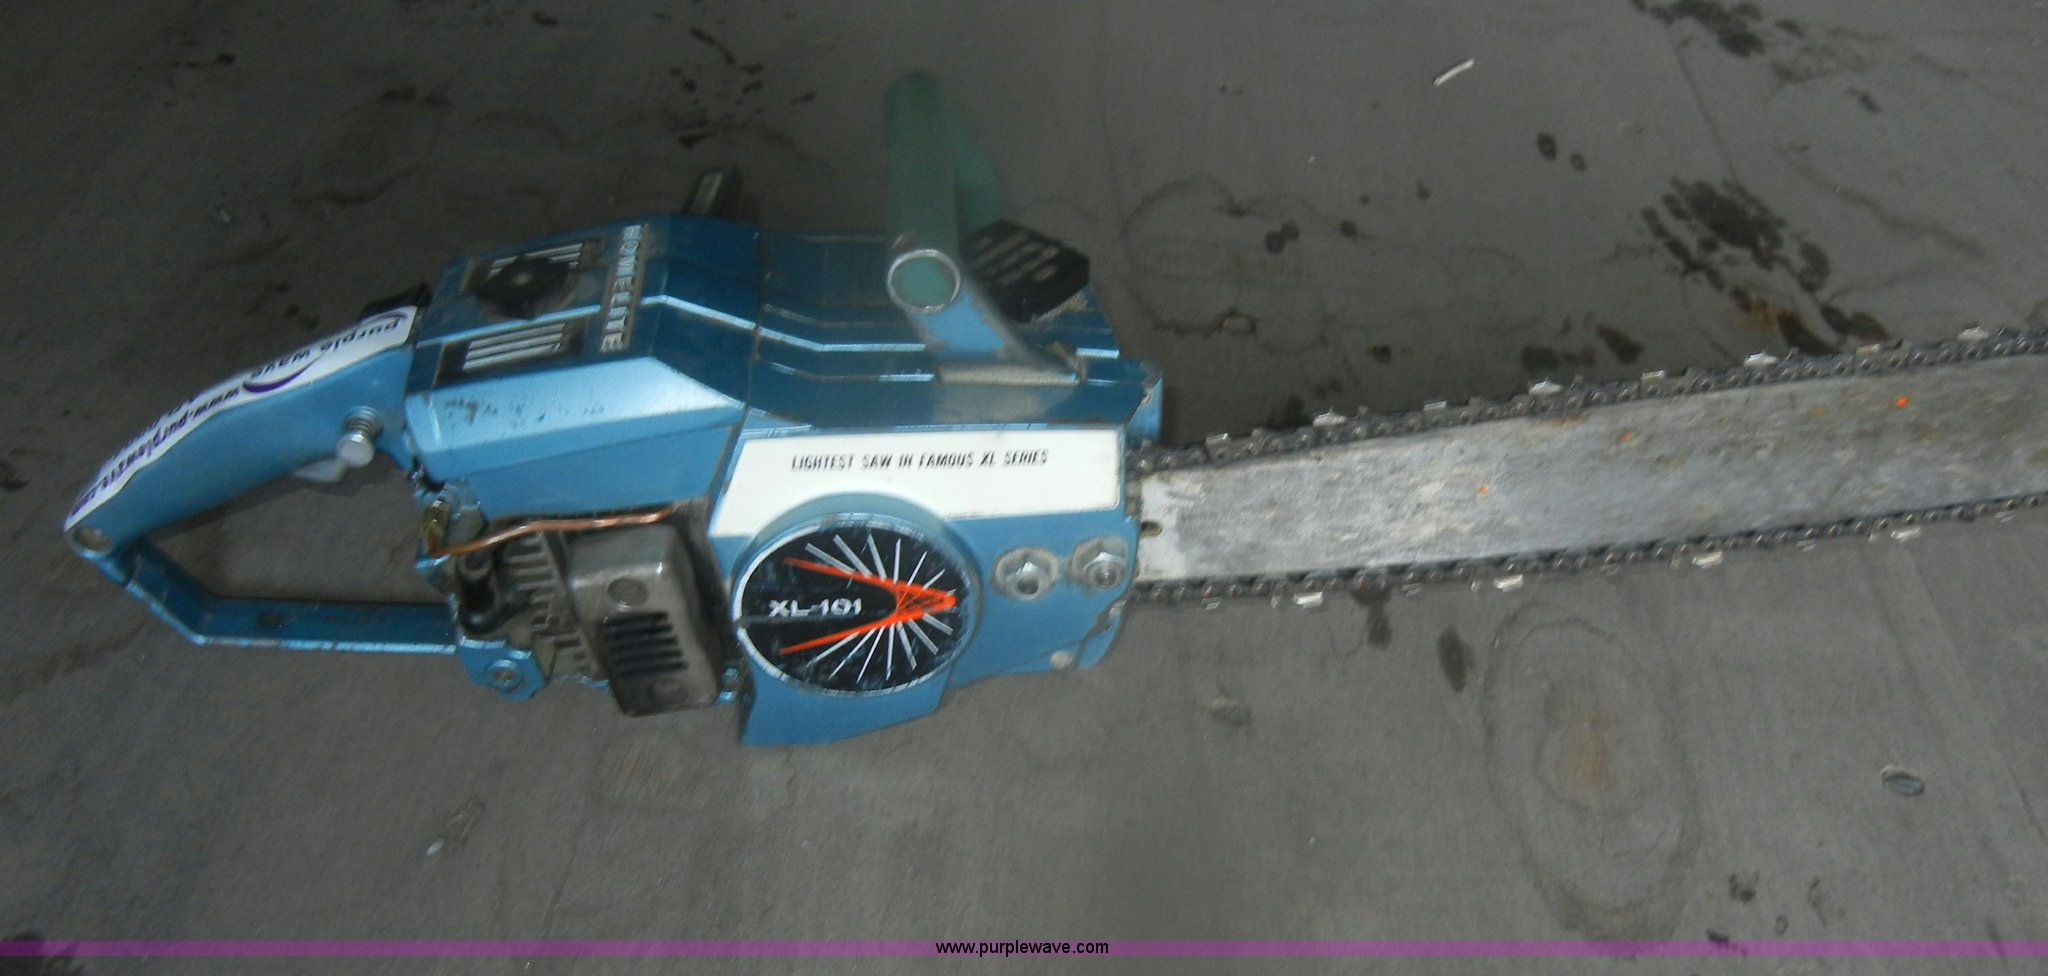 Homelite XL-101 chainsaw   Item AB9804   SOLD! Wednesday Feb